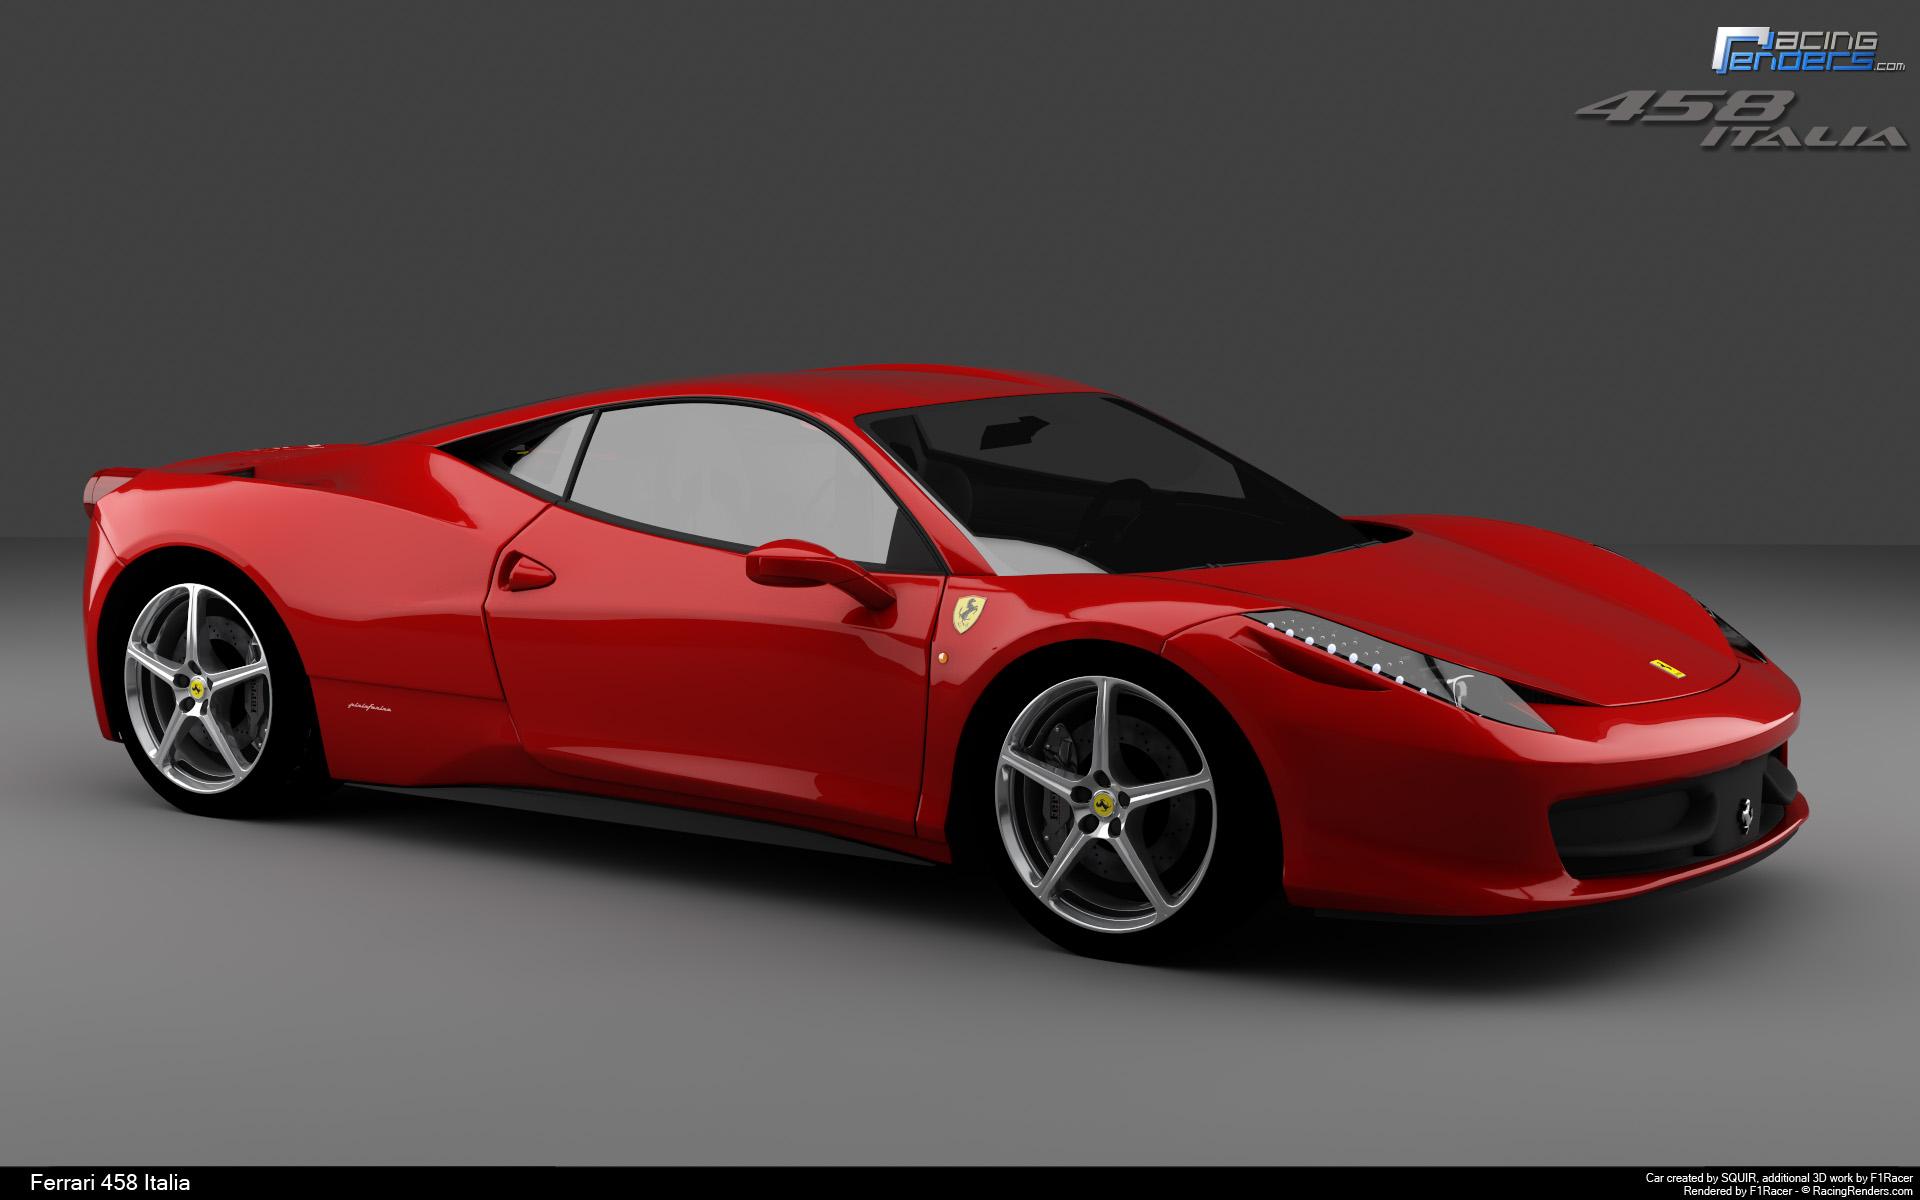 Ferrari 458 Italia hd Wallpapers 1080p Ferrari 458 Italia Wallpaper 1920x1200